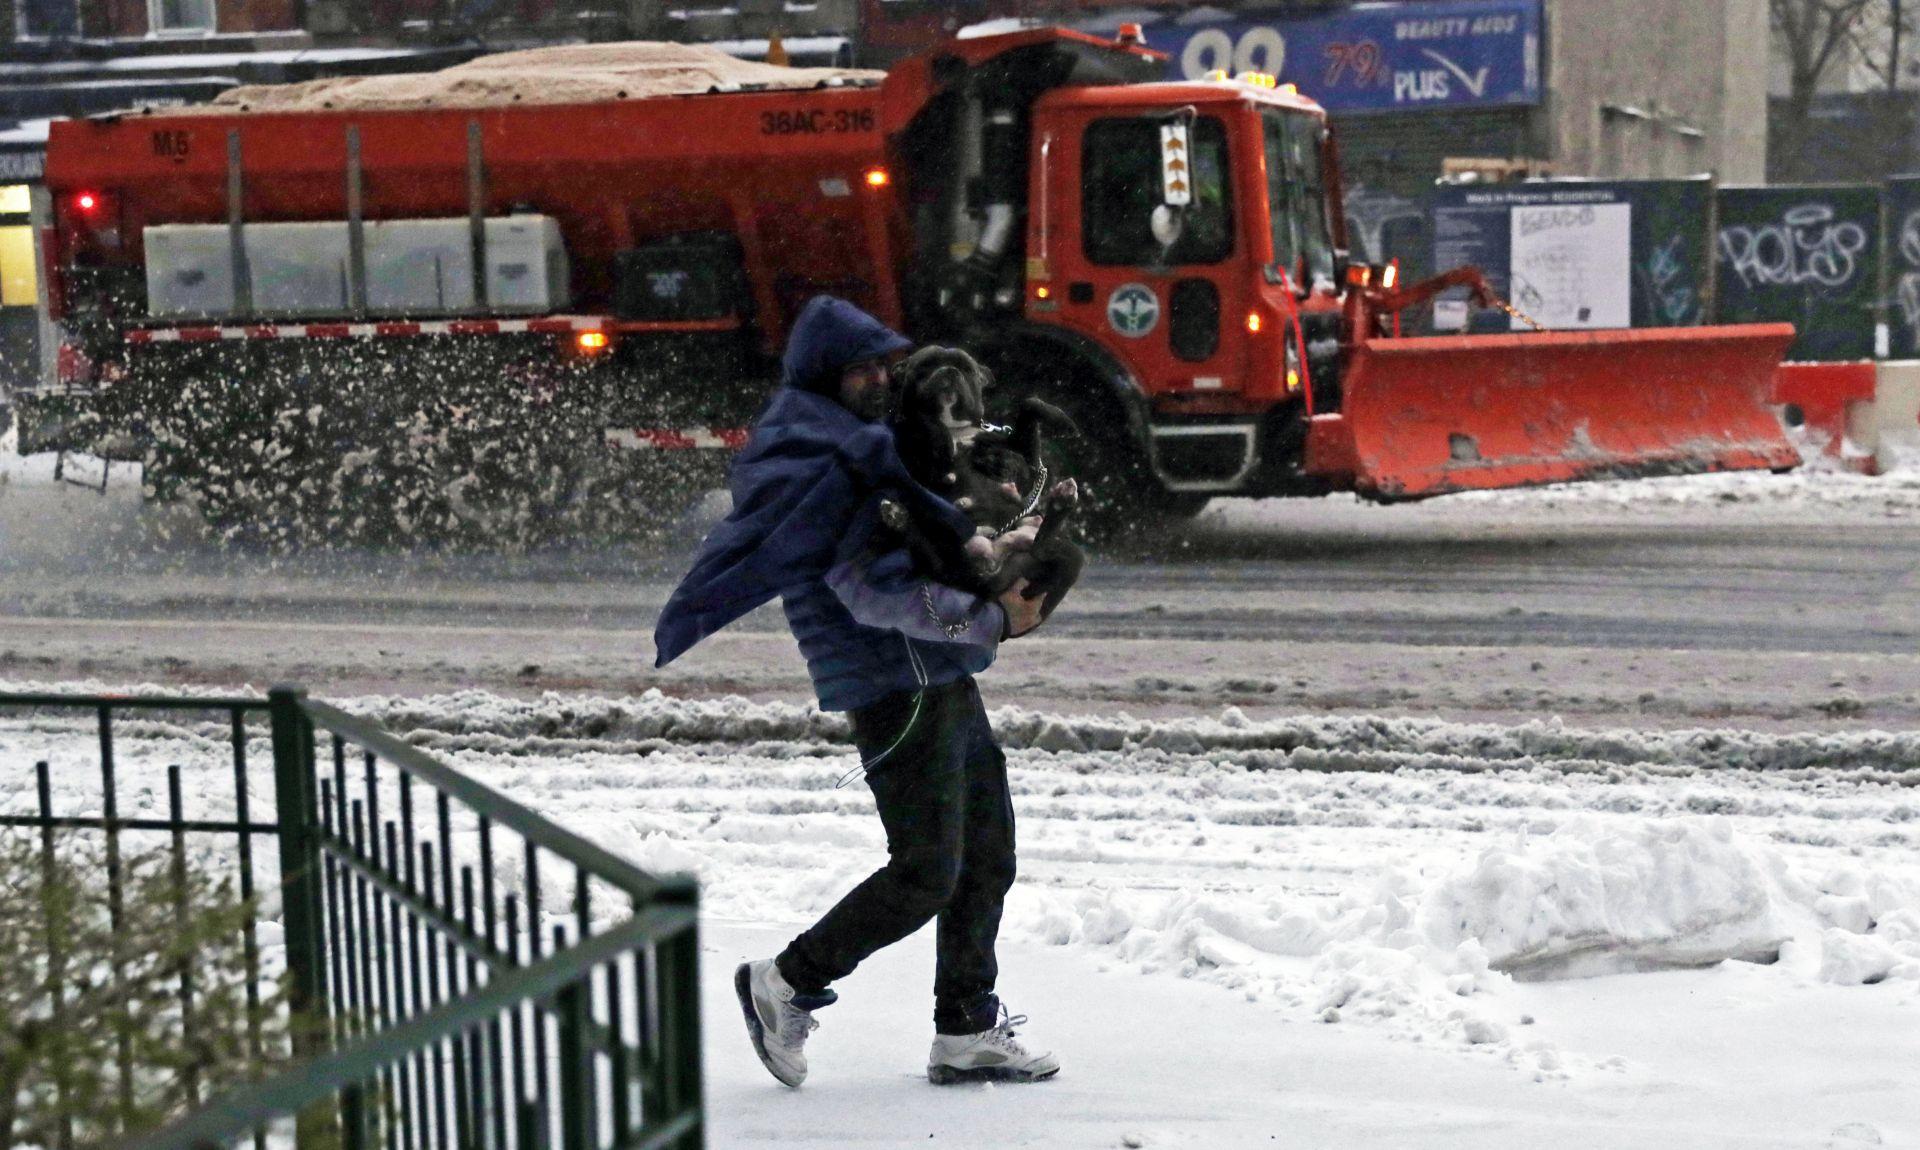 Snježna mećava paralizirala promet na sjeveroistoku SAD-a